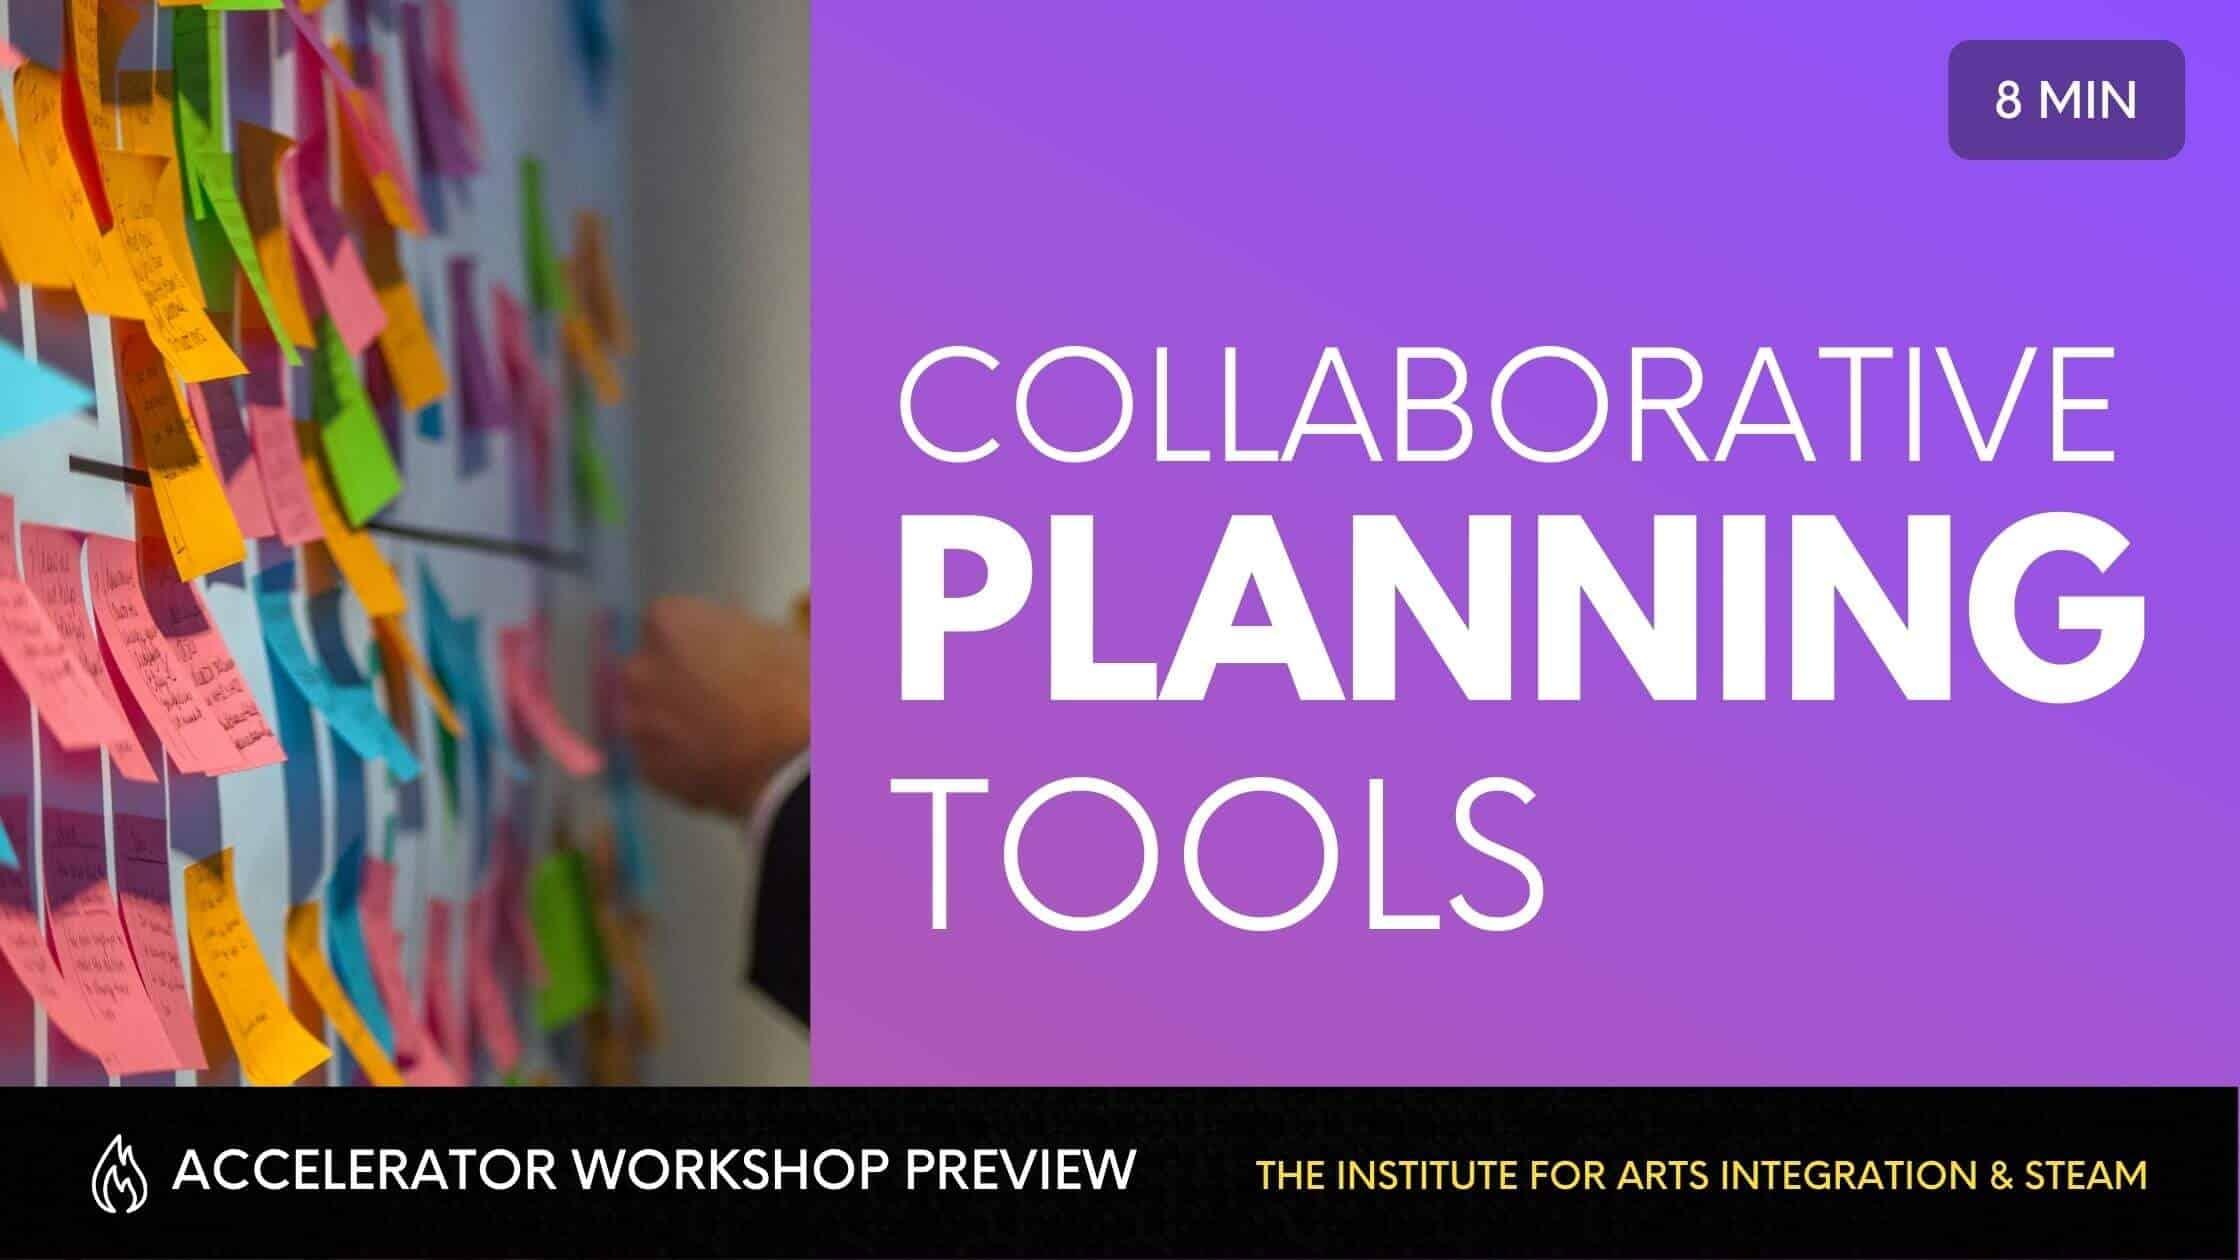 Collaborative Planning Tools